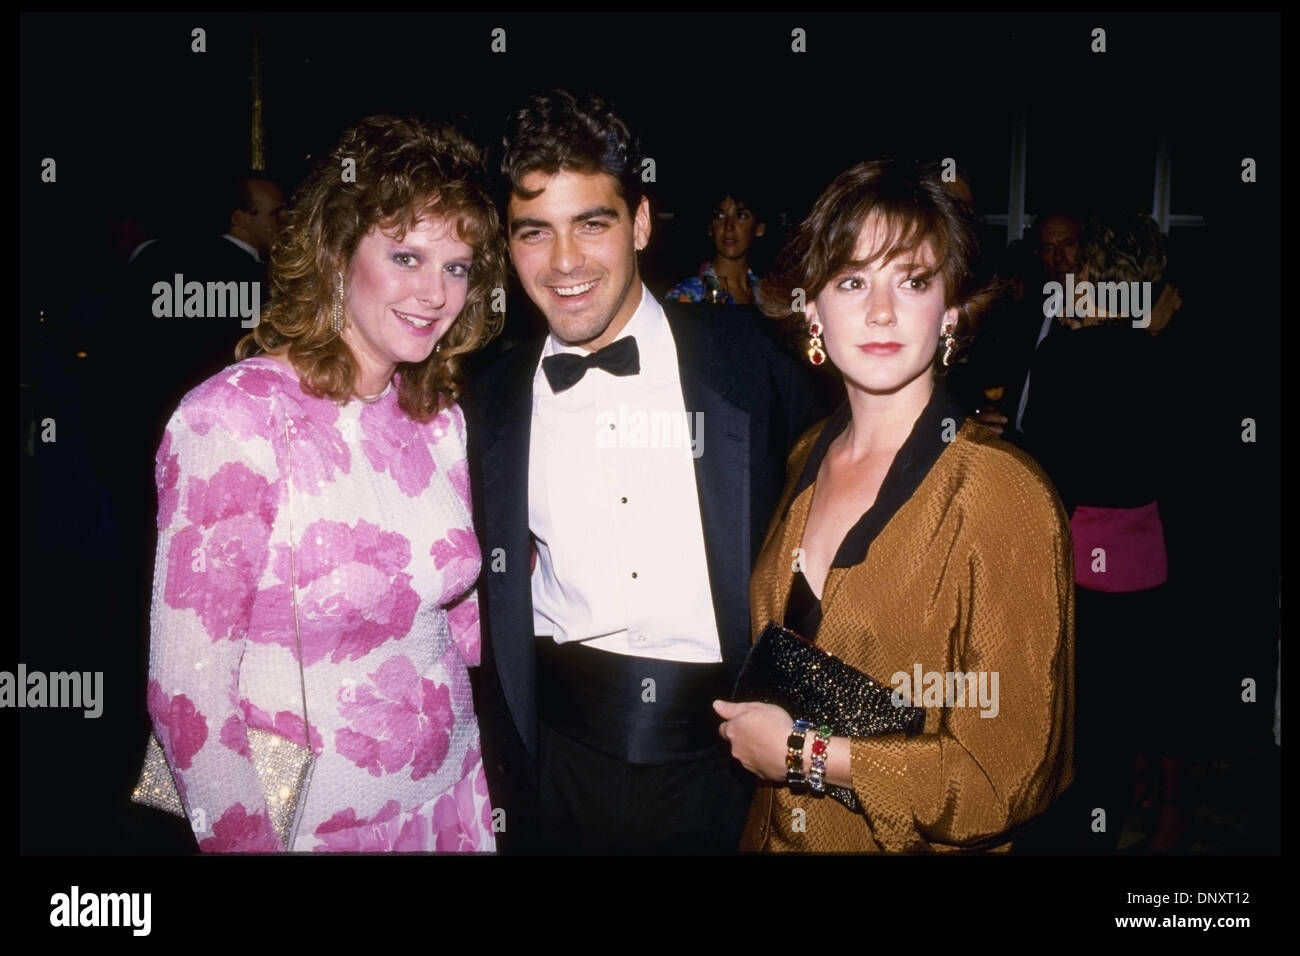 Joanne Dru,Kelly Rohrbach Sex image Maja Salvador (b. 1988),Eileen Ryan